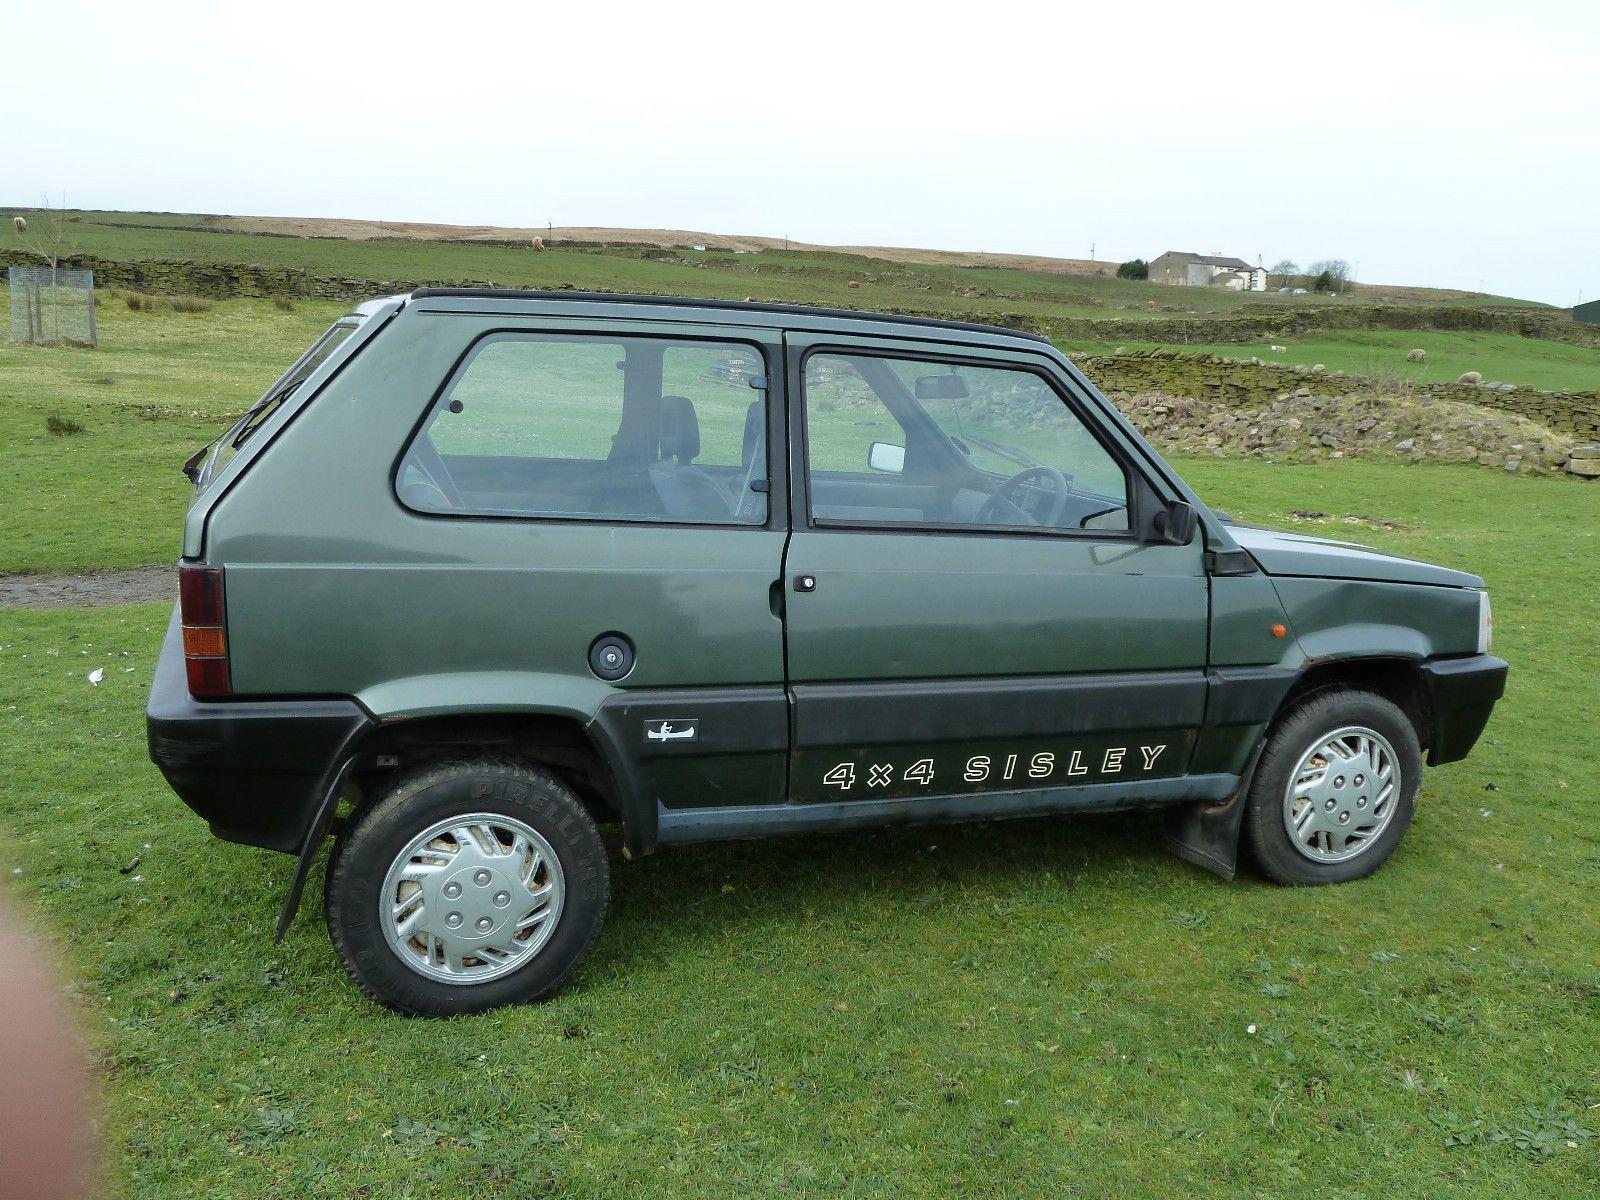 1990 Fiat Panda Sisley 4x4 Classic Green Mot Low Mileage Fiat Panda Fiat Panda